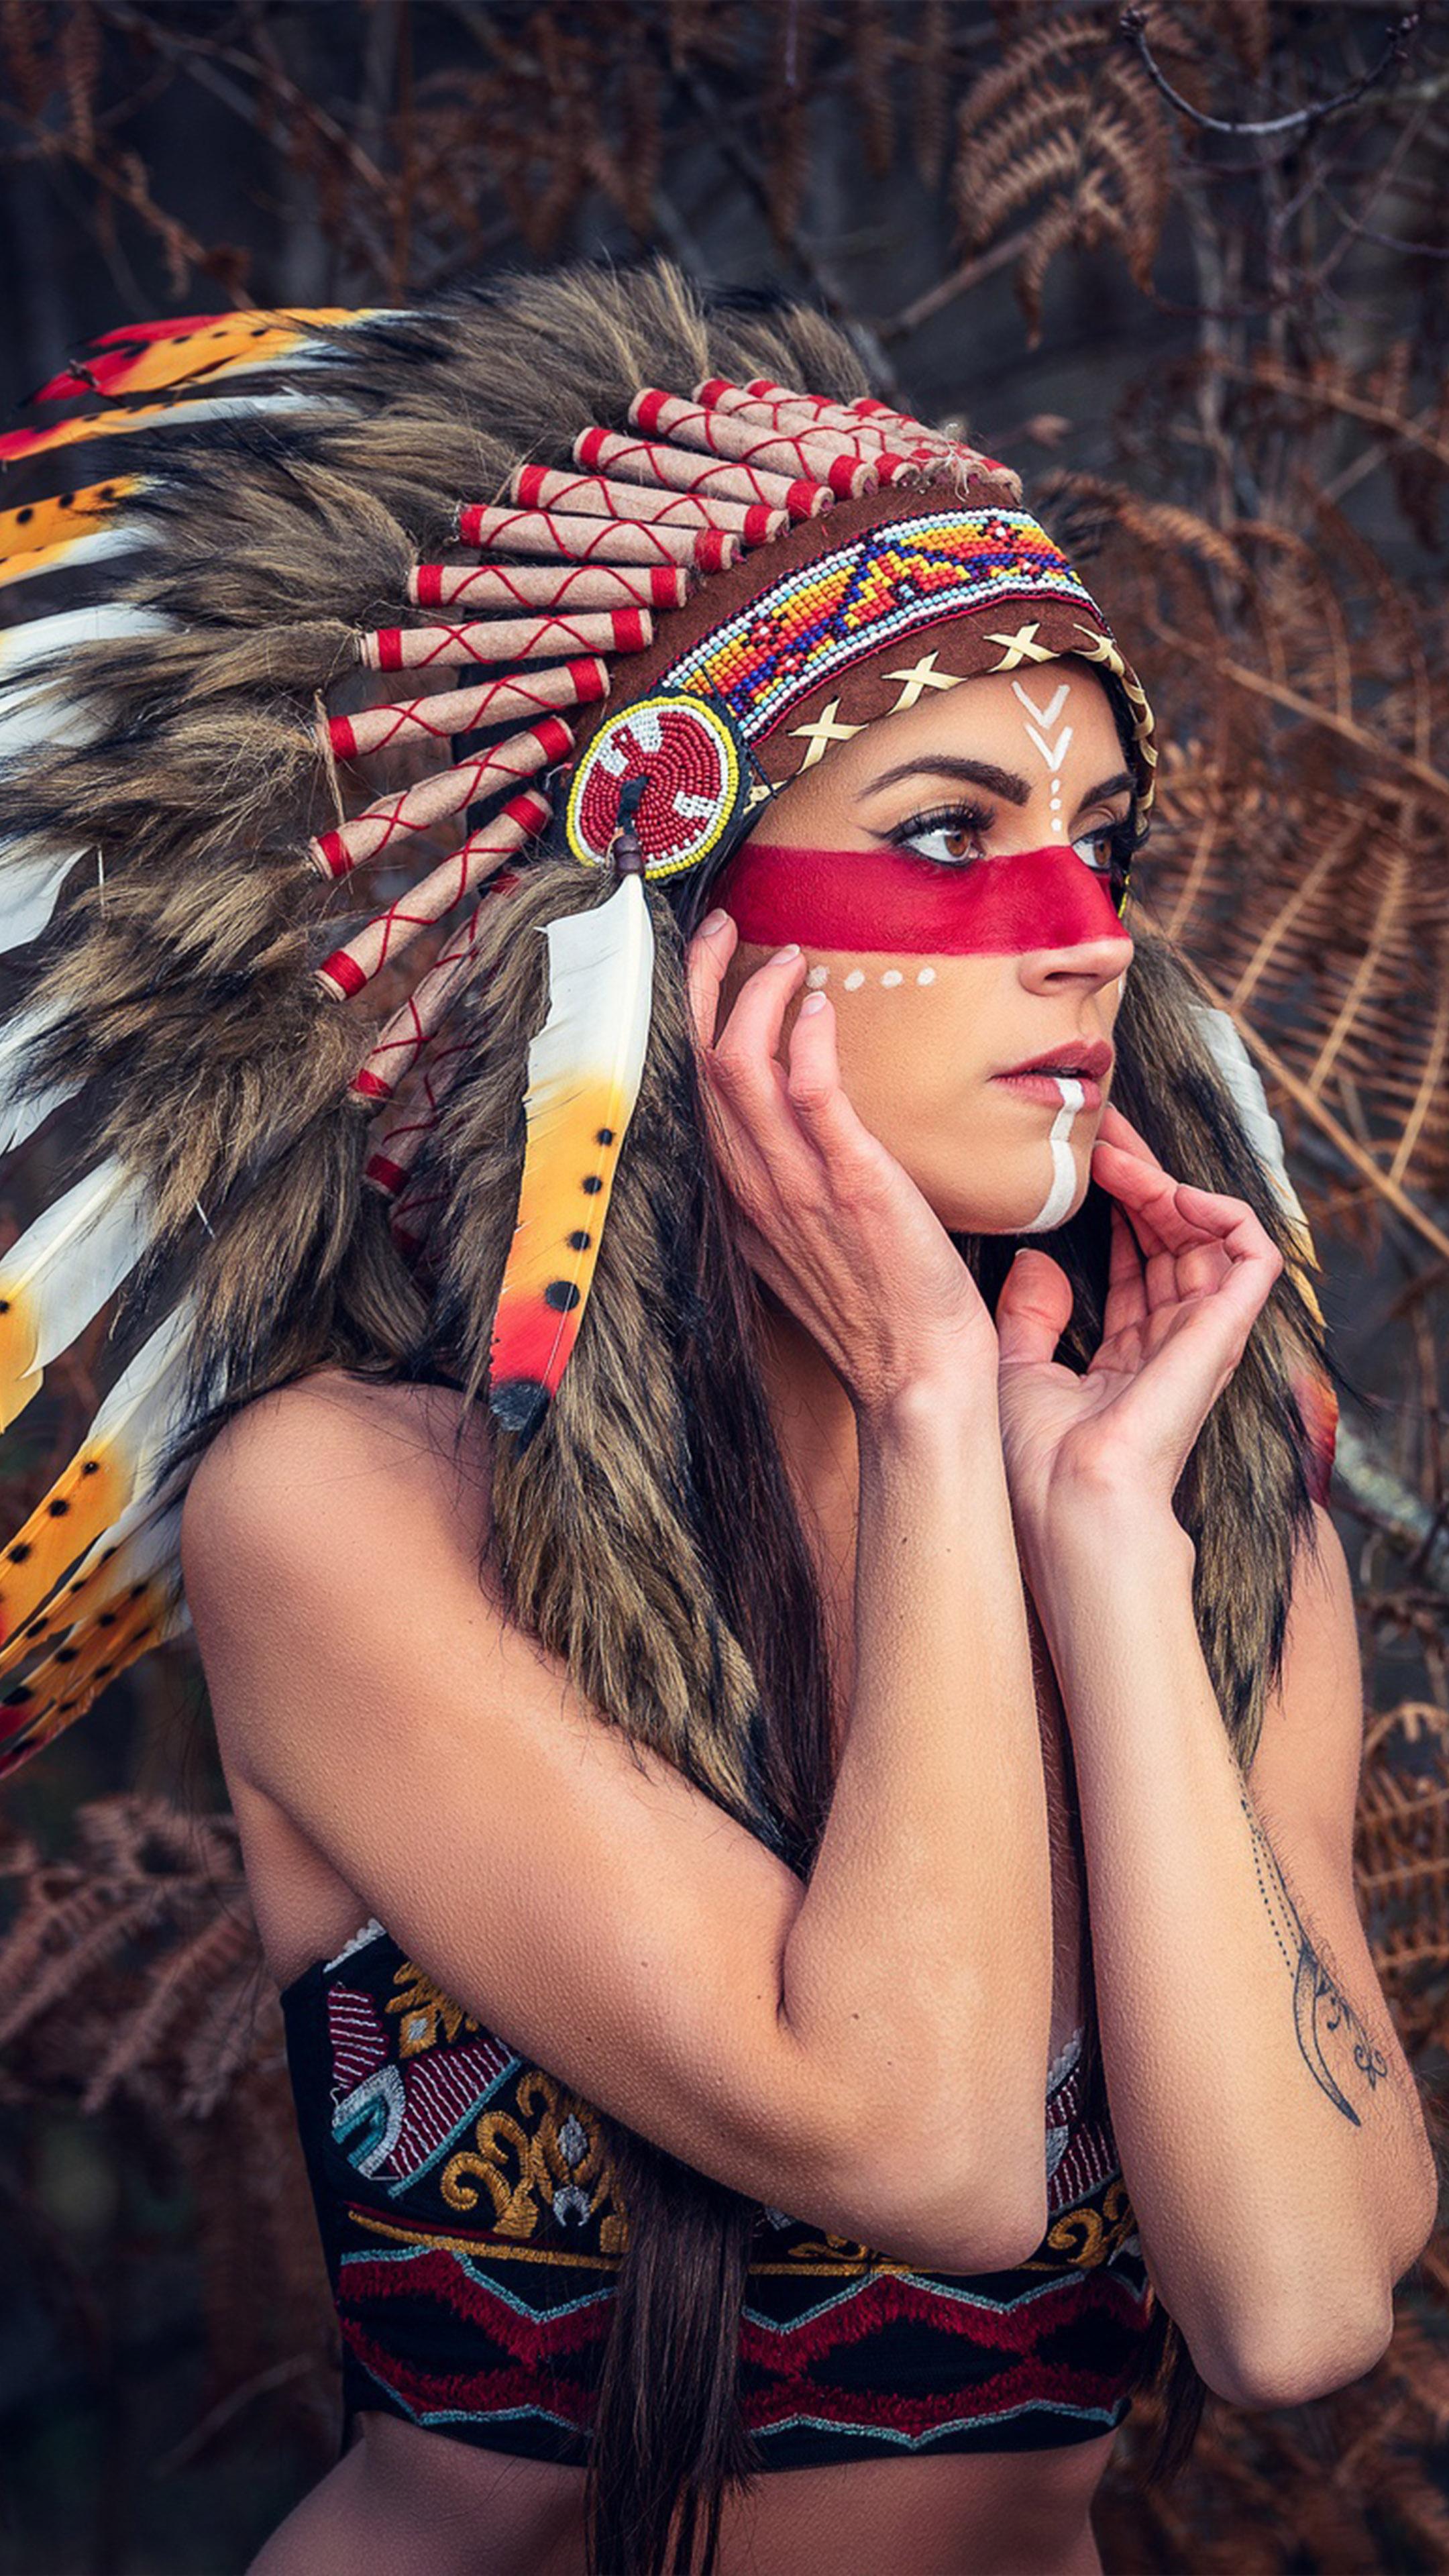 Girl Headdress Native American Free 4k Ultra Hd Mobile